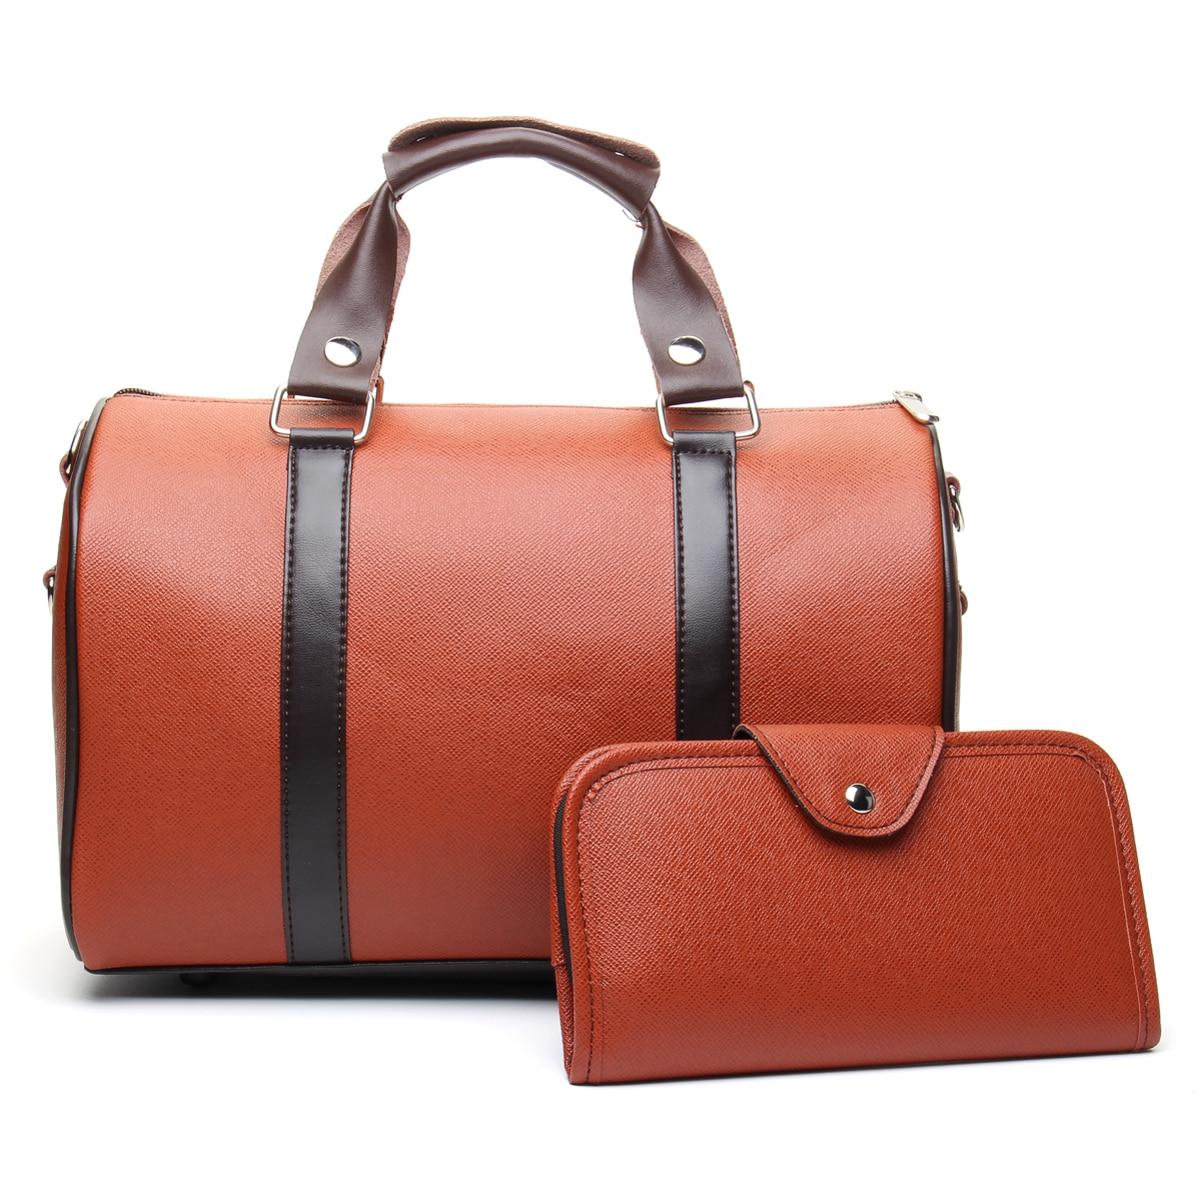 Extra Large Salon Handbag+Storage Bag Hairdressing Tool Messenger bag Toolkit Portable Tool Hairstyling Case<br>